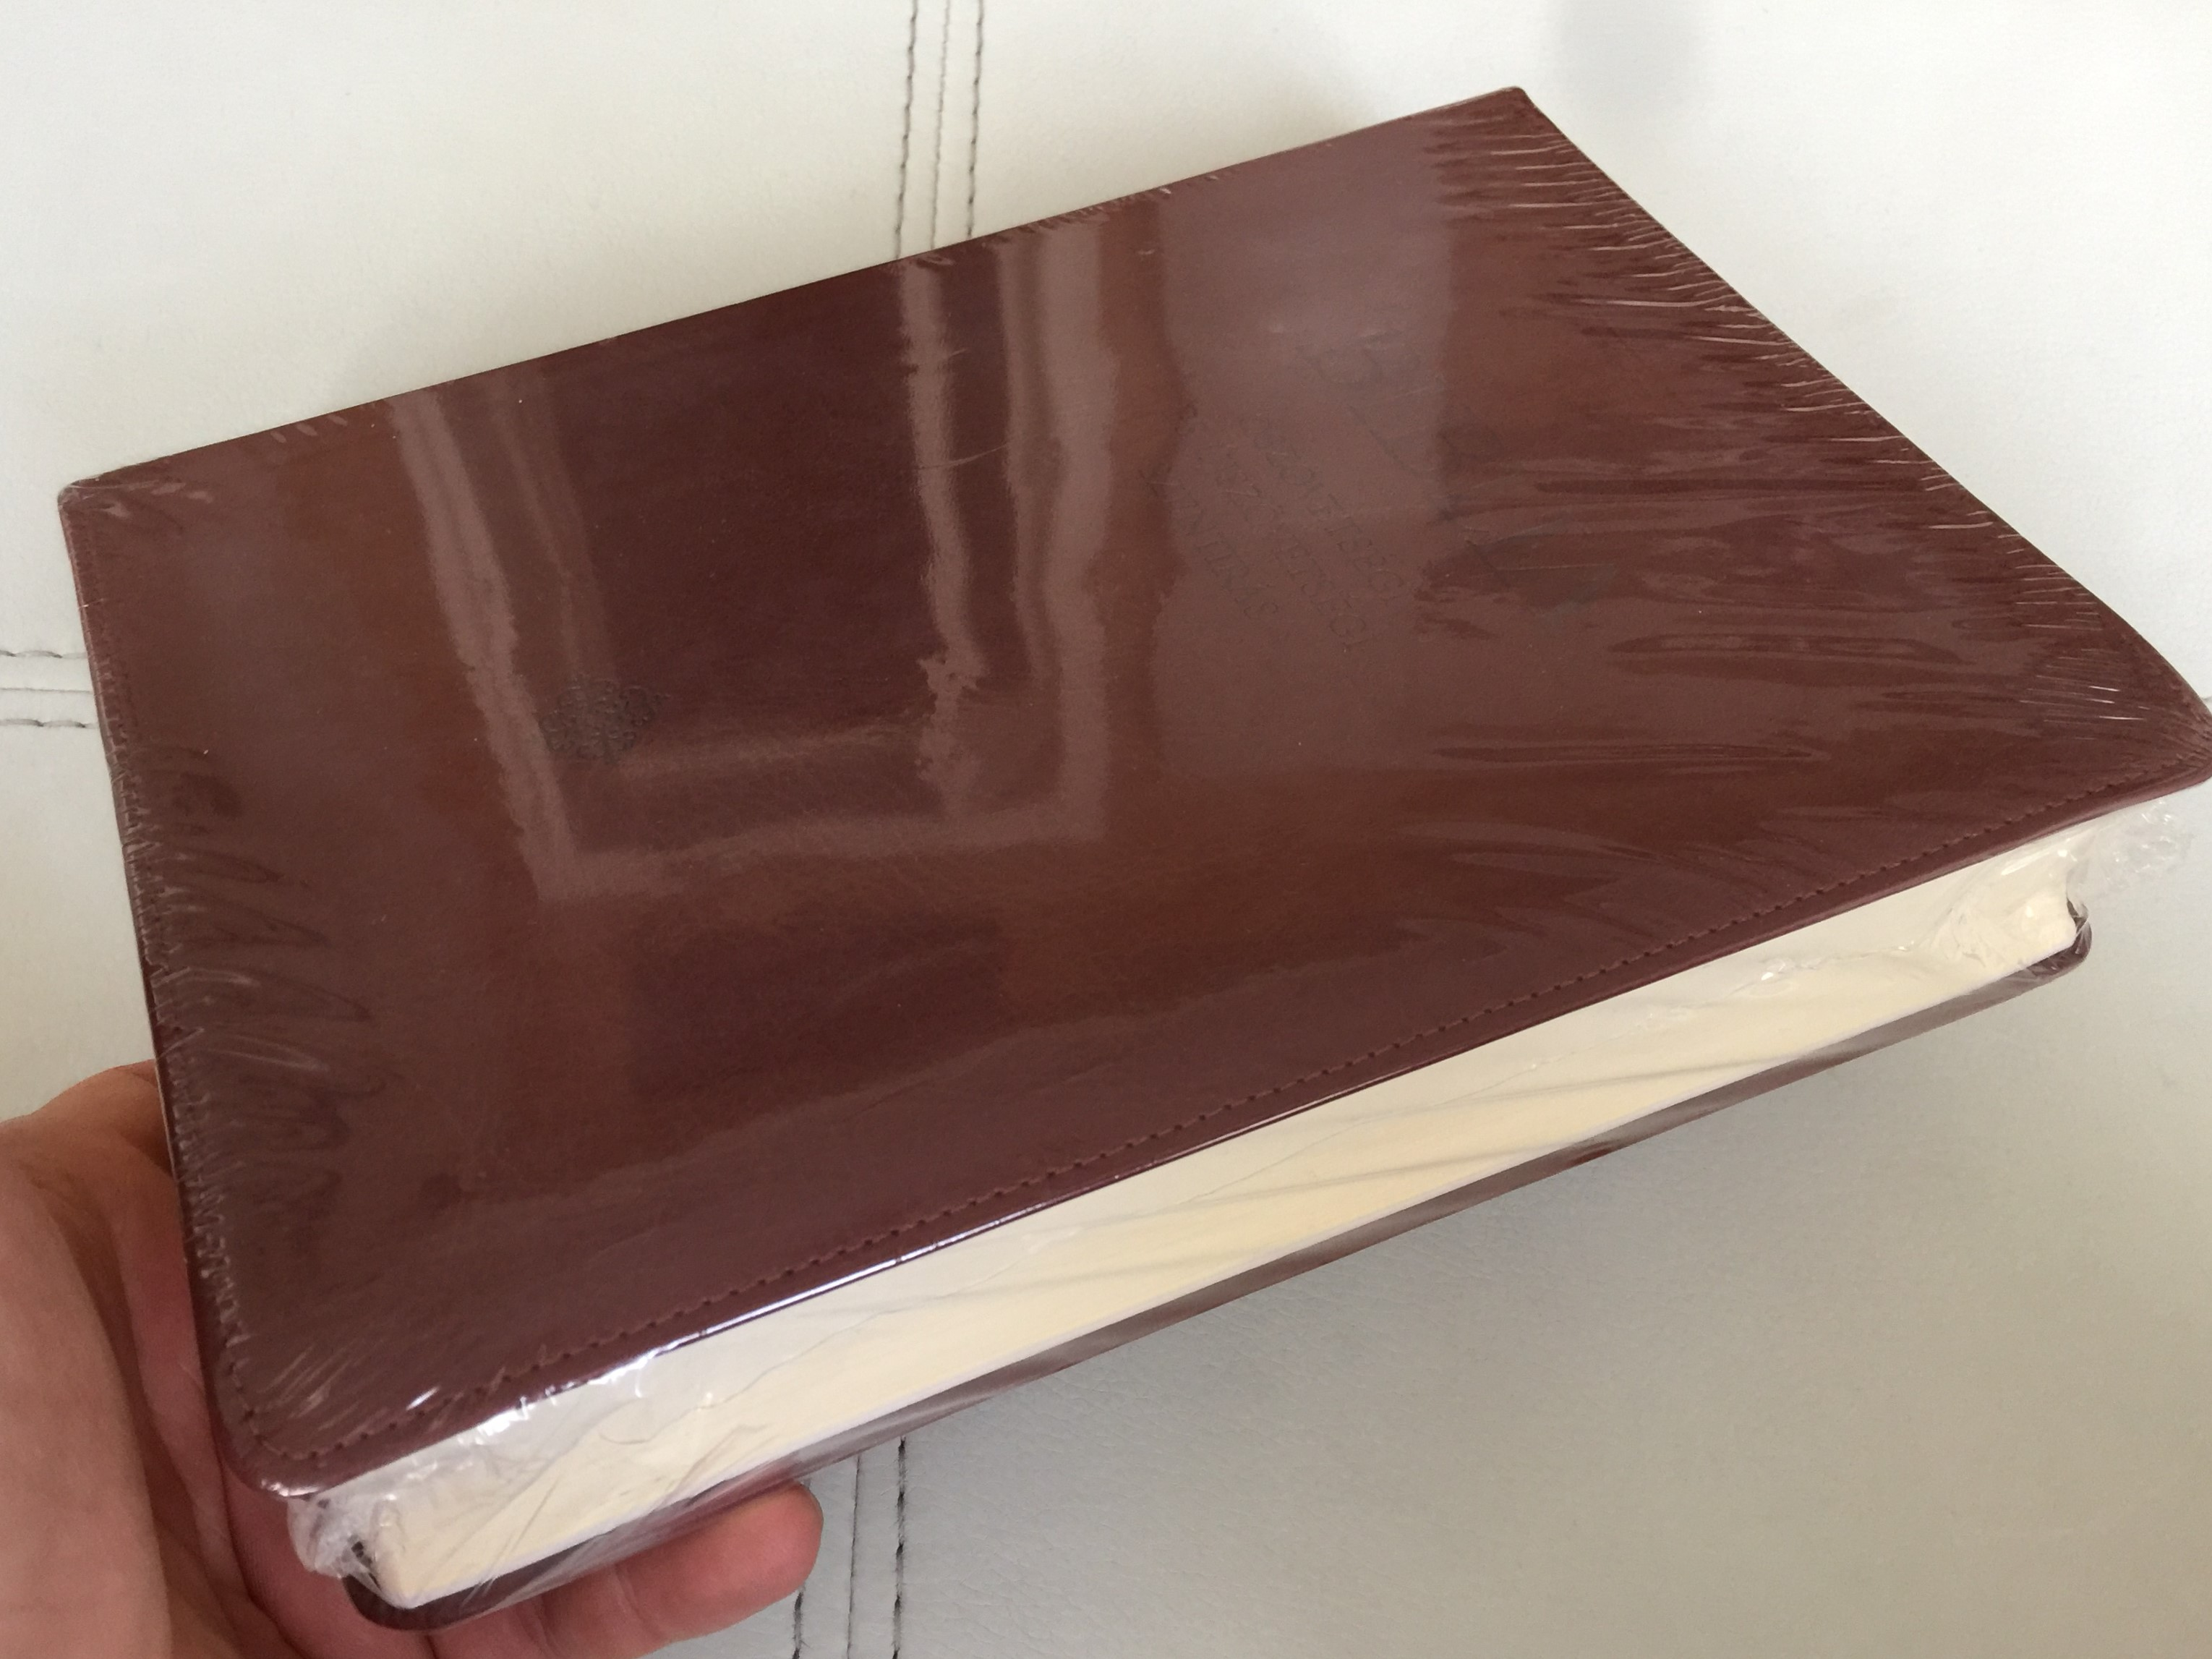 hungarian-large-print-catholic-family-bible-leather-bound-dark-brown-csal-di-biblia-2.jpg